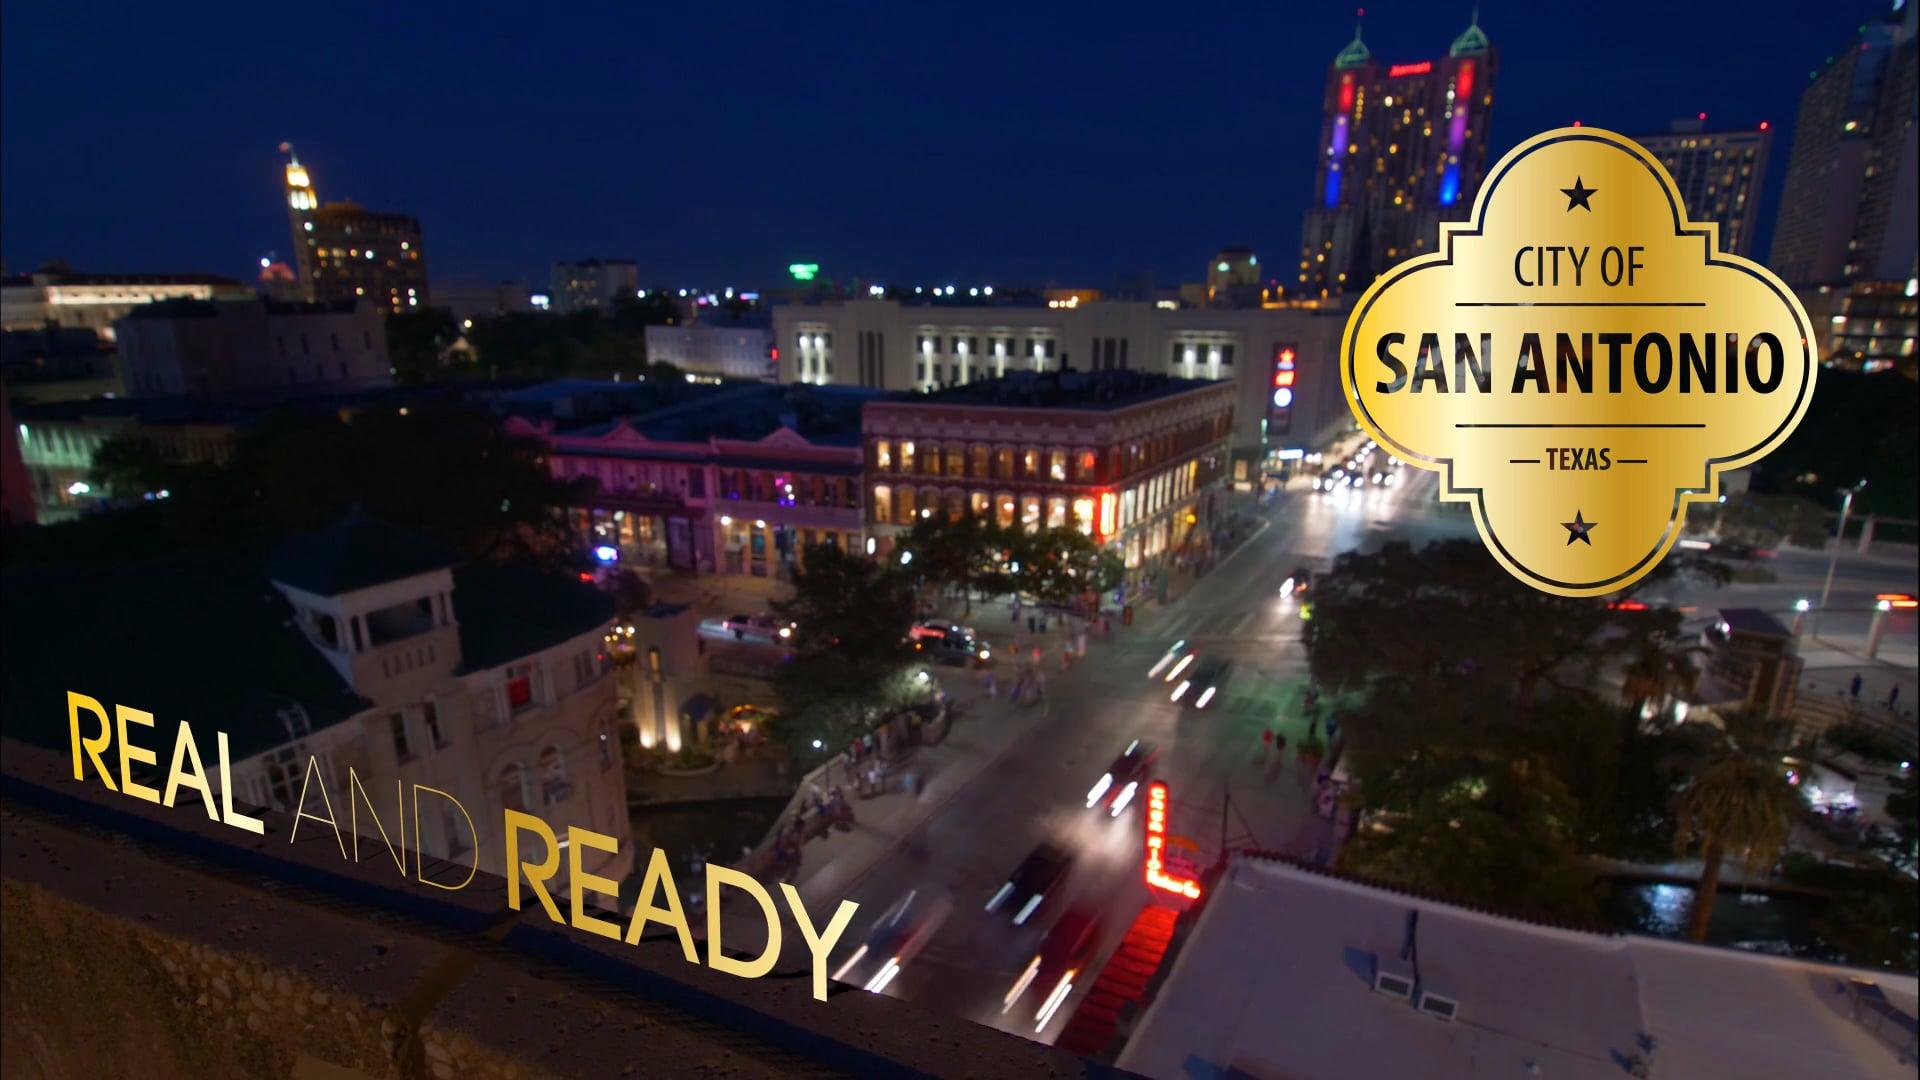 San Antonio-Real and Ready